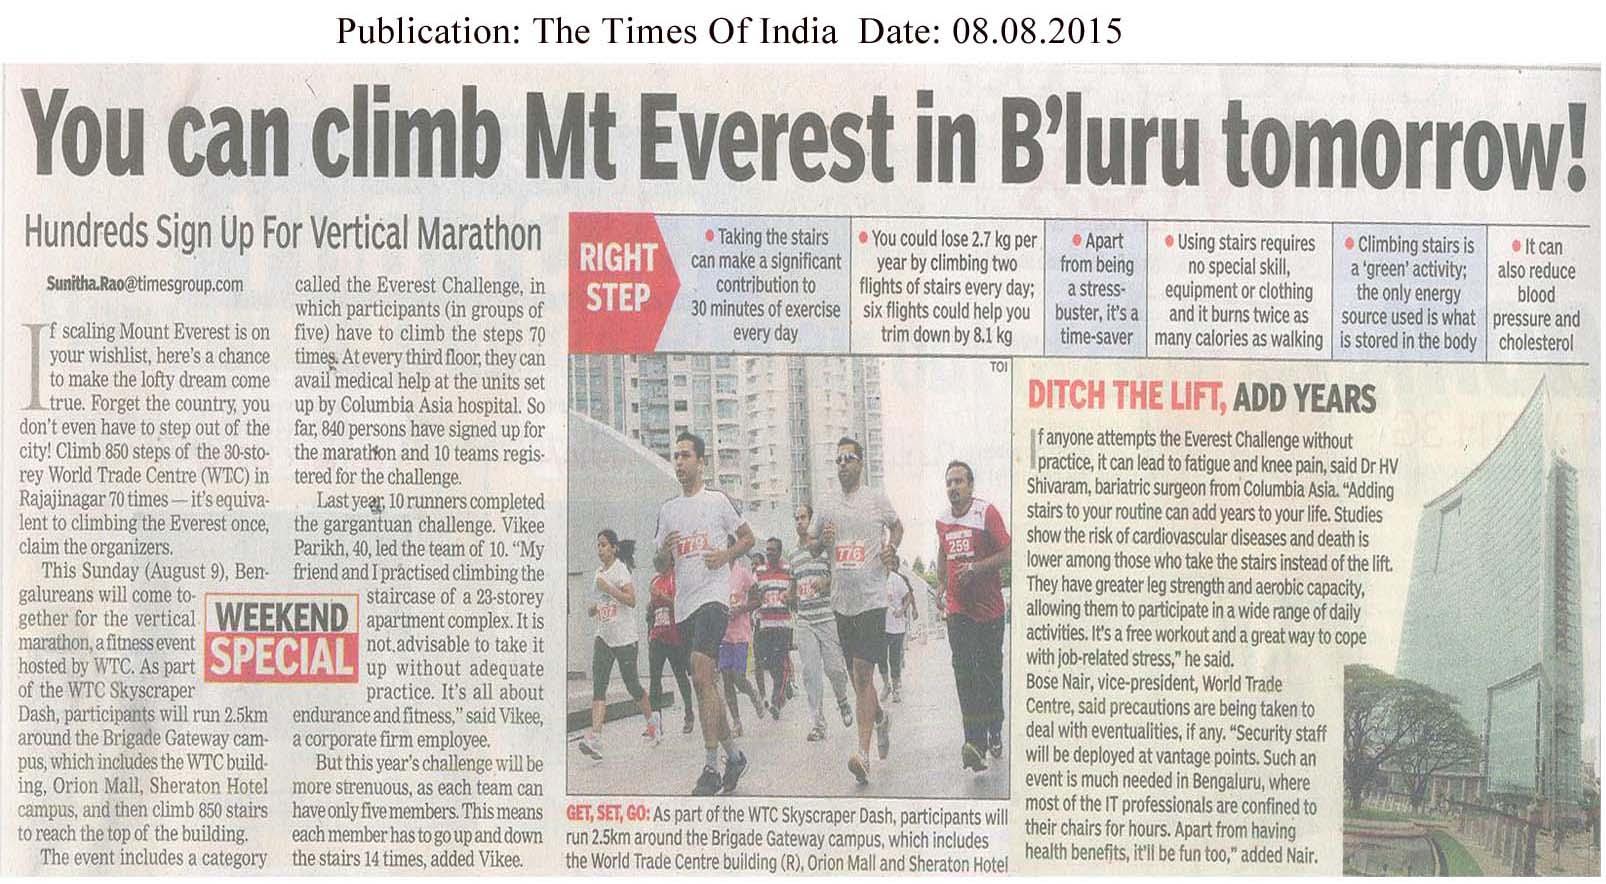 You can climb Mt Everest in B'luru tomorrow